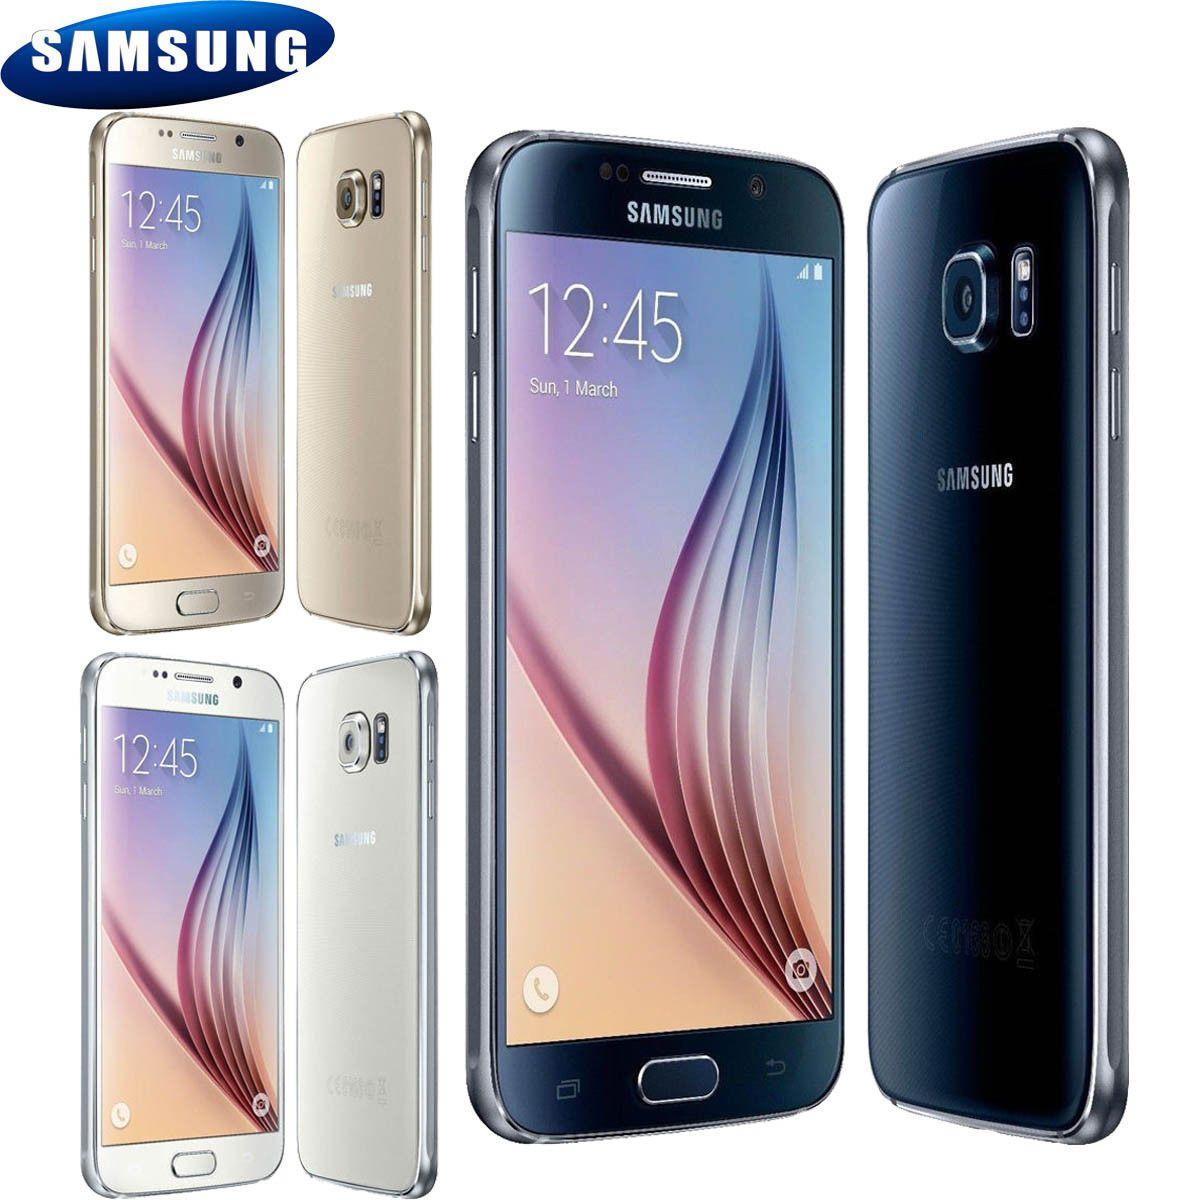 New Samsung Galaxy S7 Edge S6 Note 4 5 Gsm Lte Quad Core G935 128 Gb Smartphone 32gb